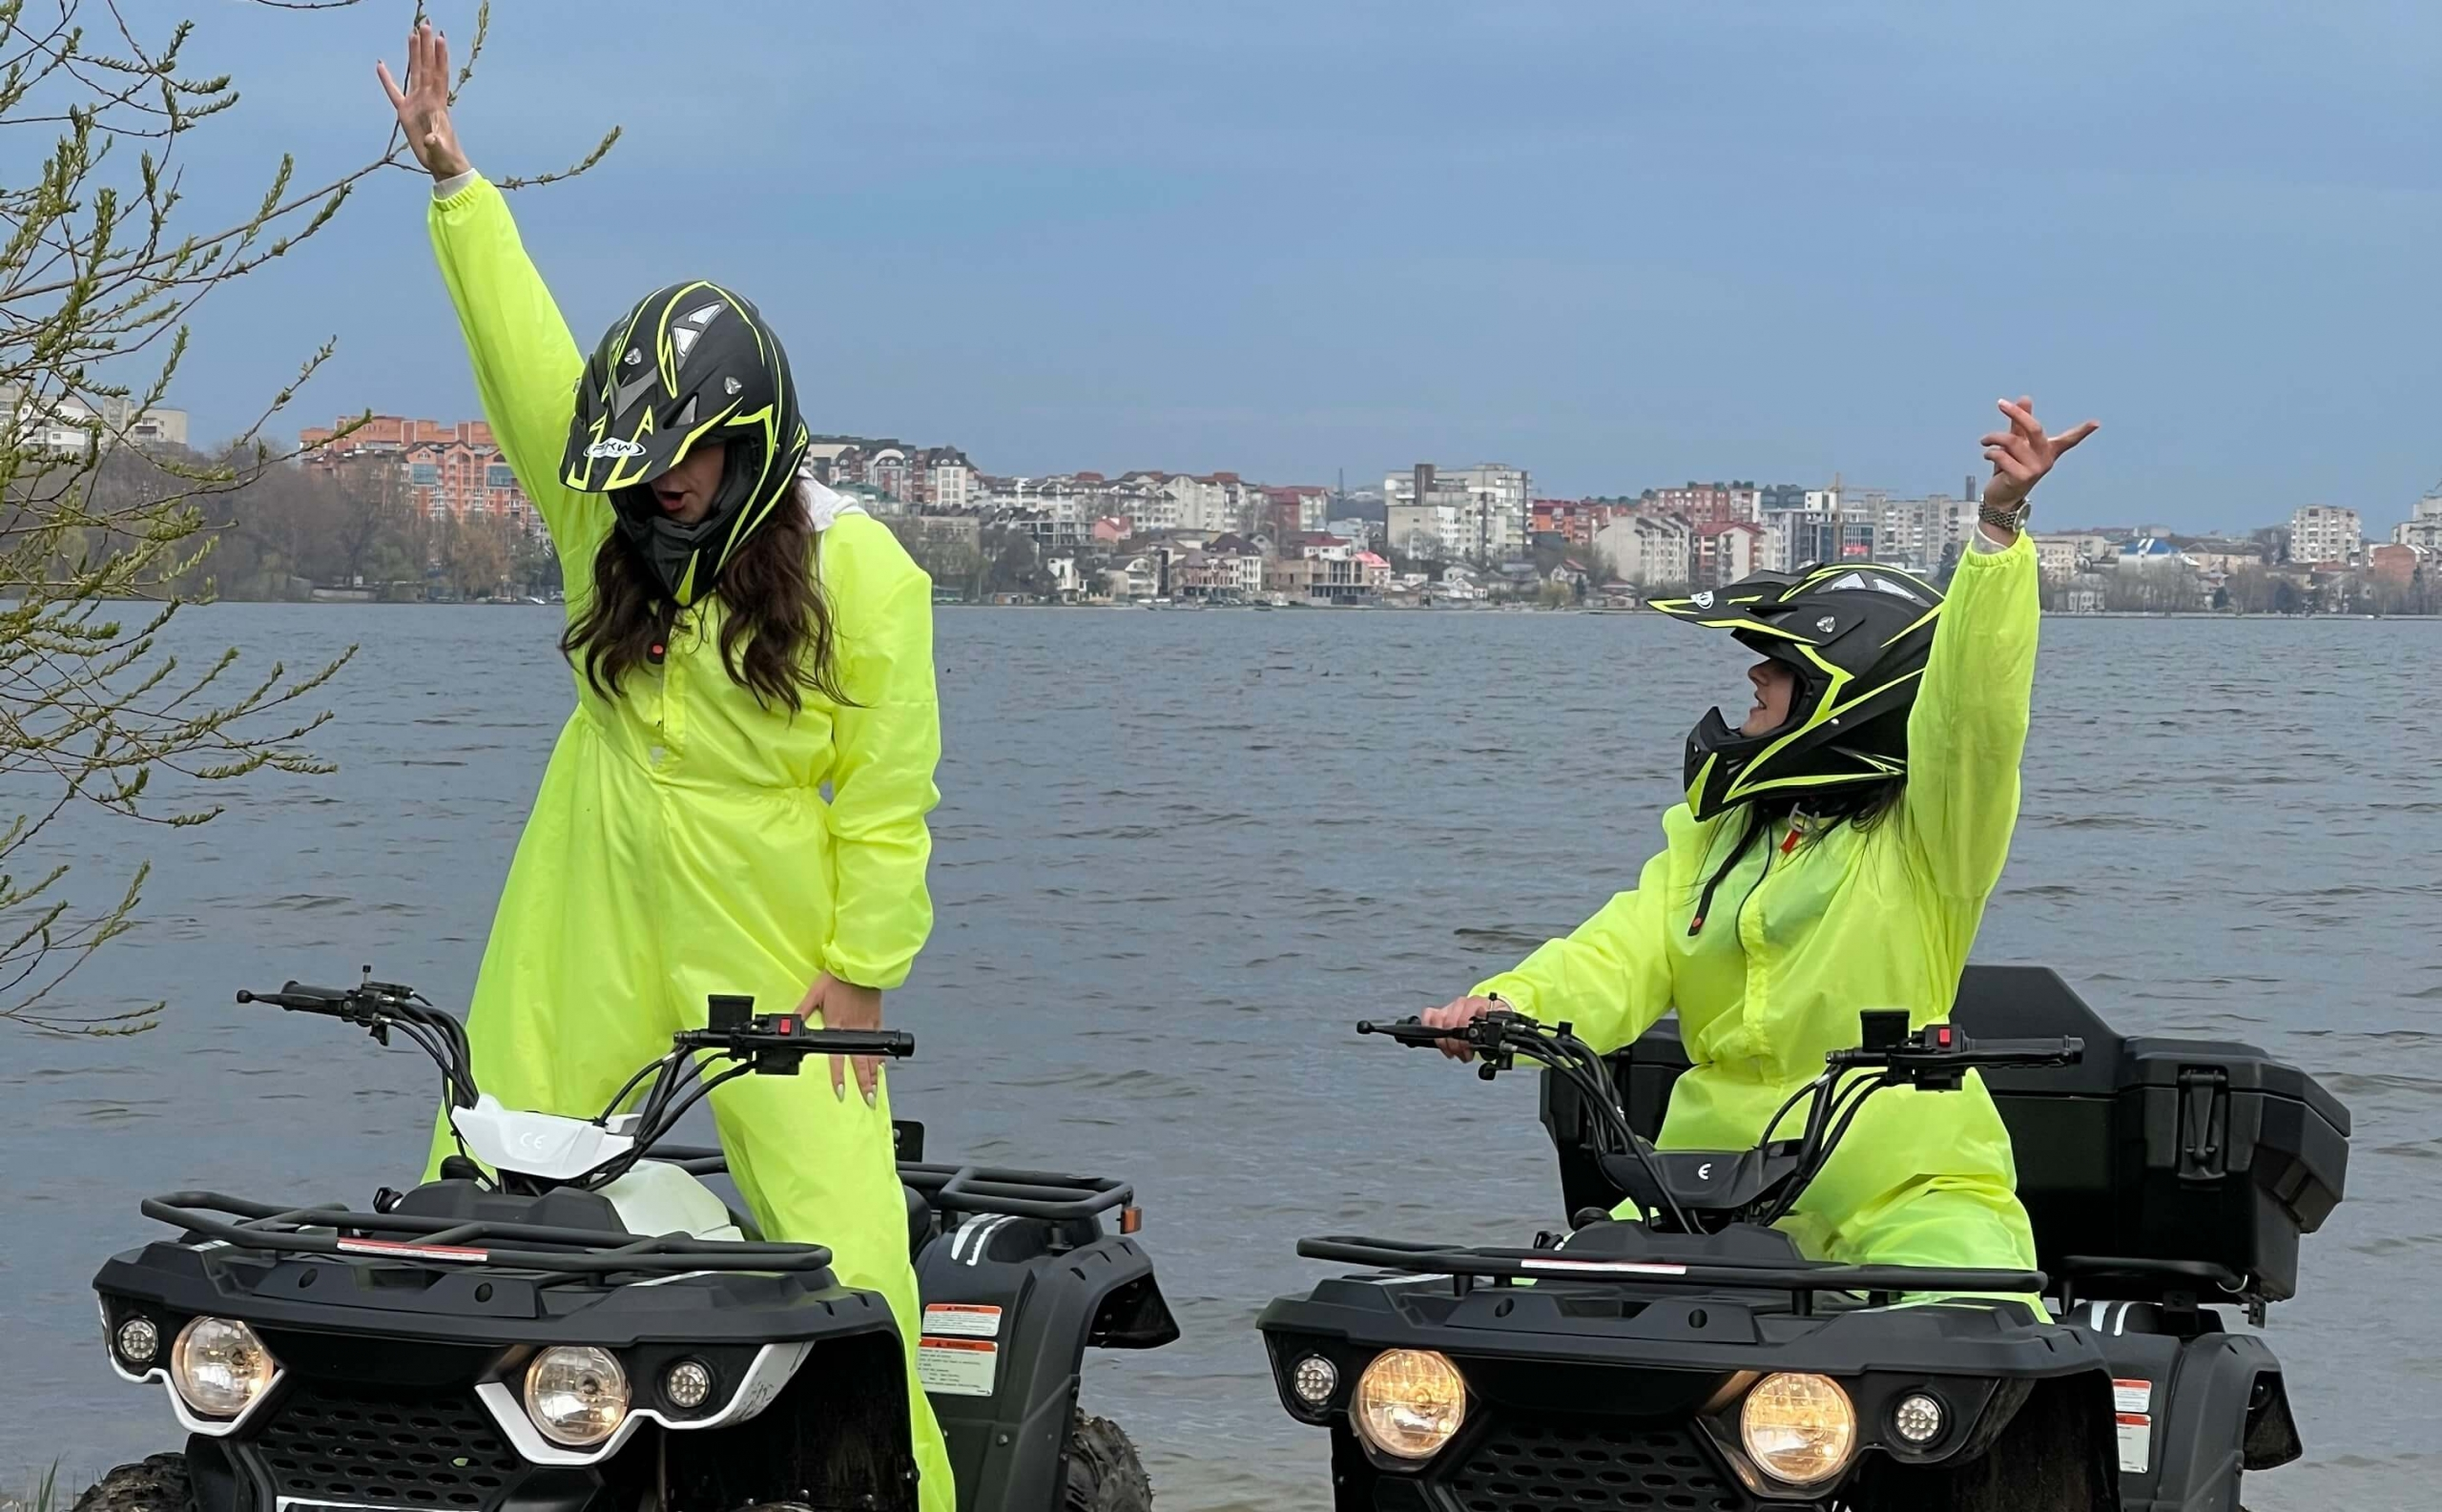 Катание на квадроцикле для двоих в Тернополе